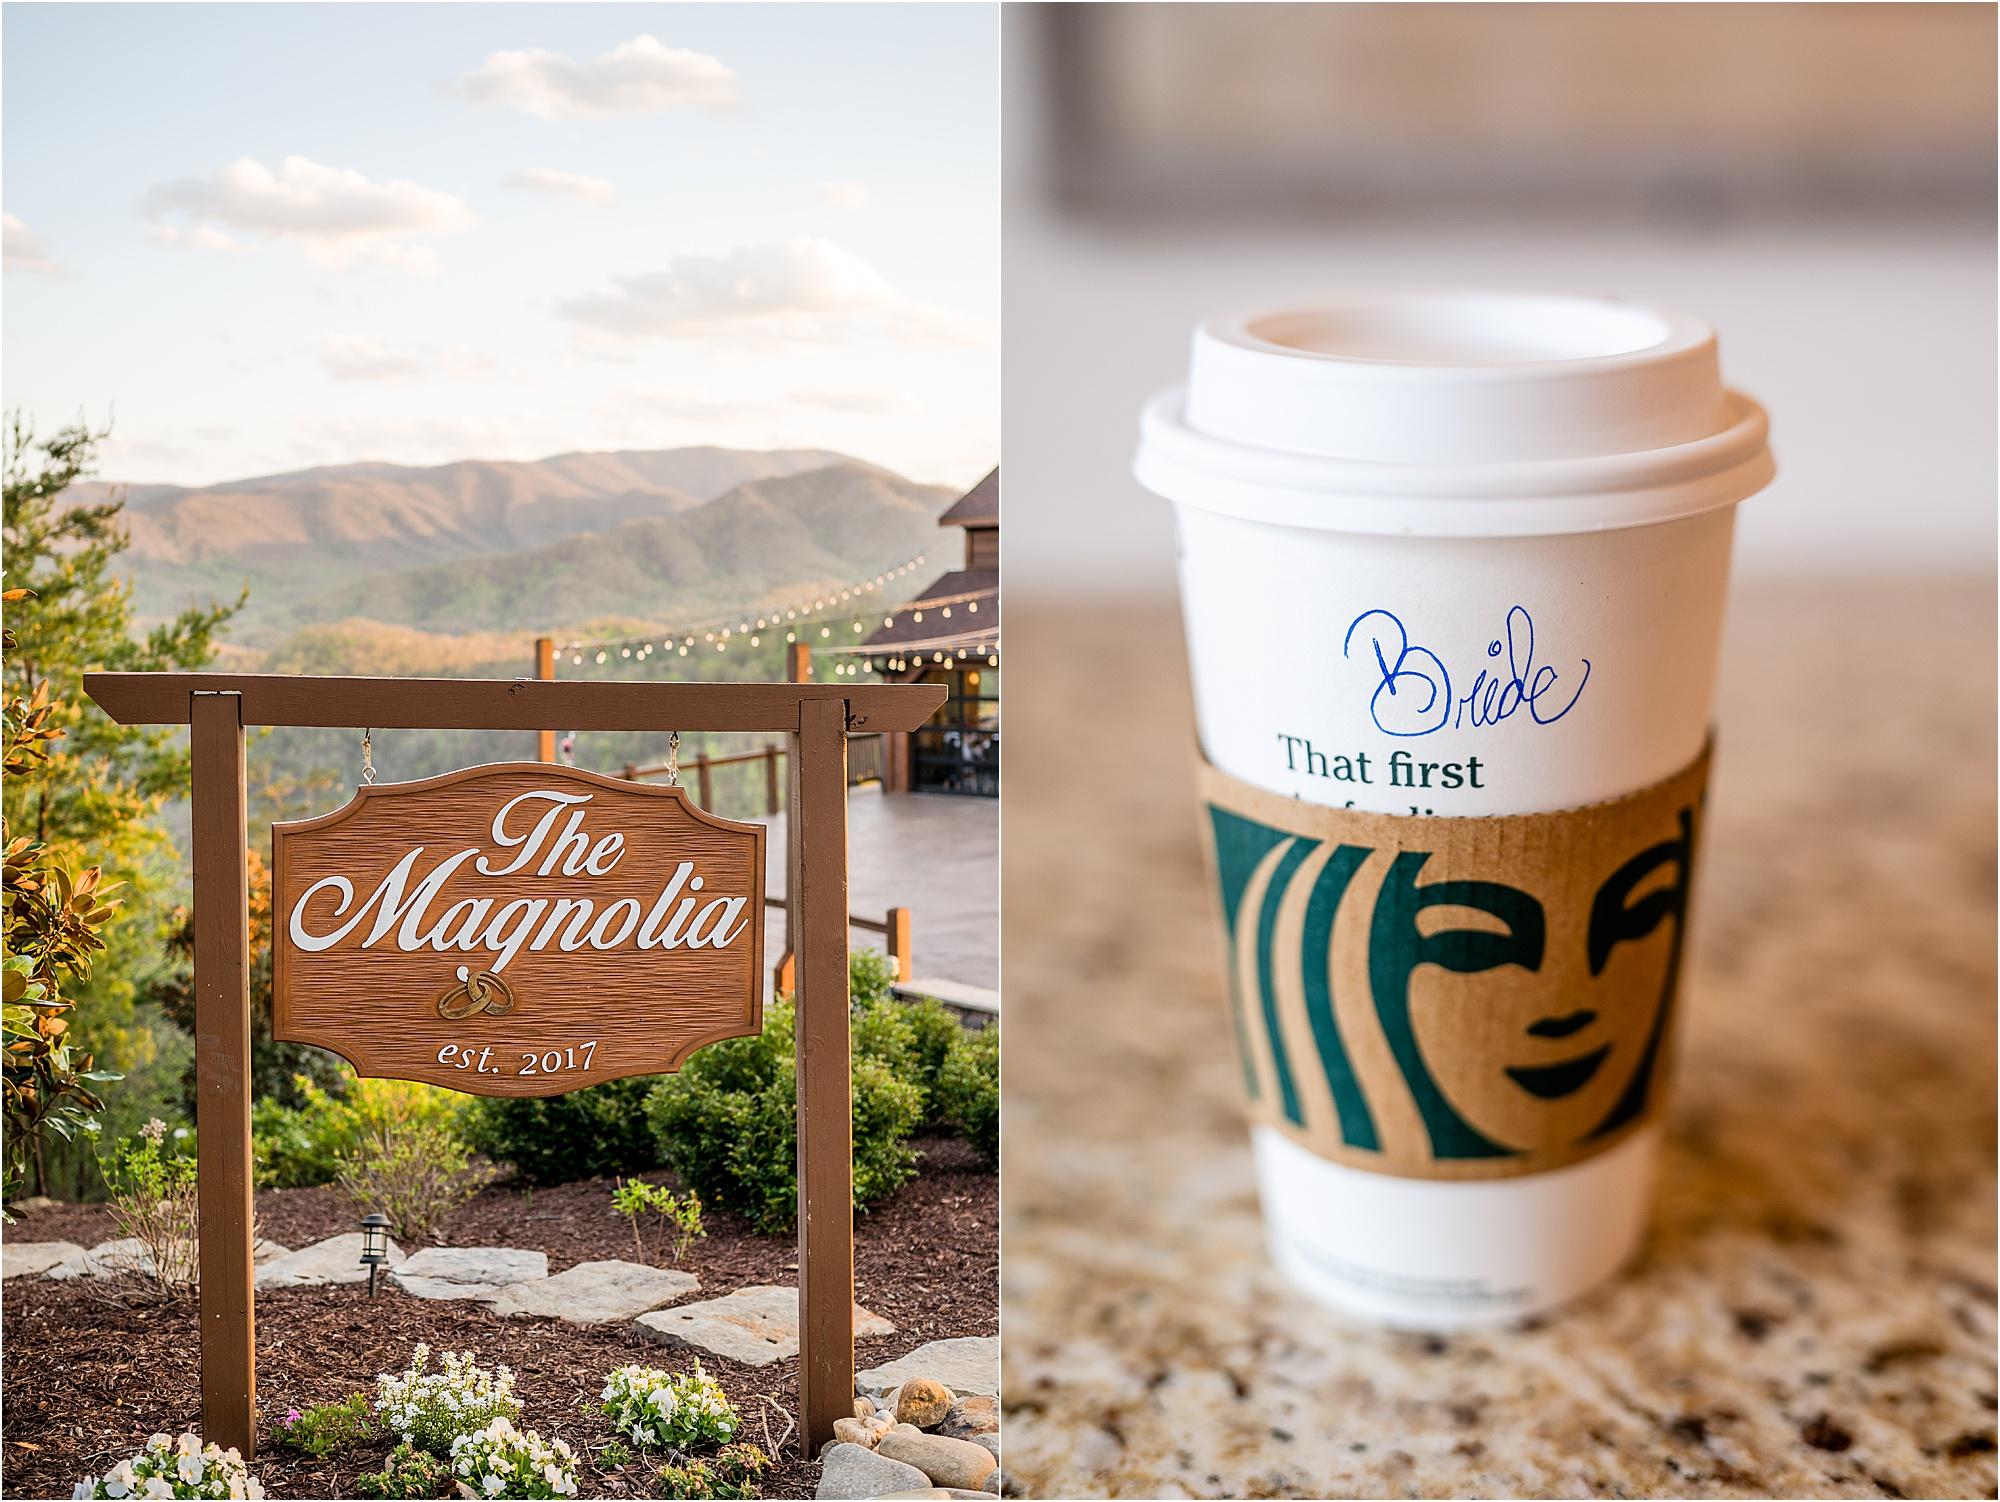 The Magnolia Venue Sign and Starbucks Bride Cup